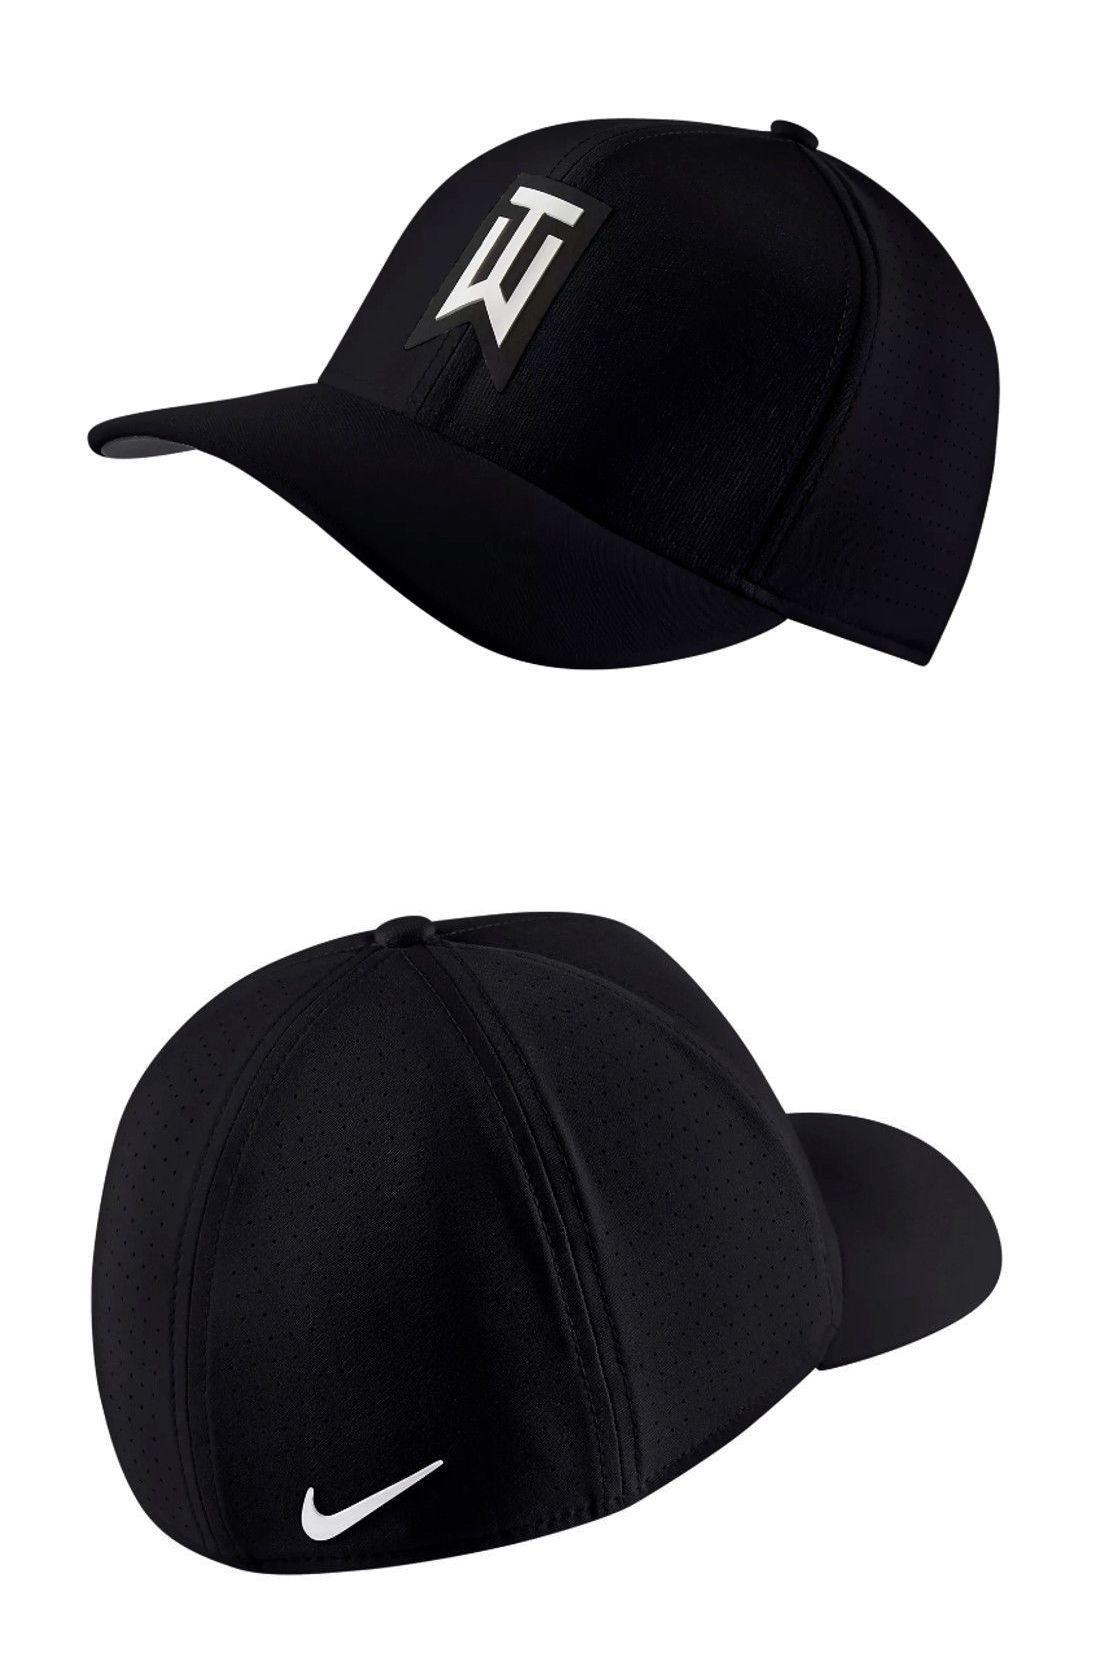 Golf Visors and Hats 158937  Nike Tiger Woods Tw Aerobill Classic99 Hat Cap  (Black 4fb99a722f6